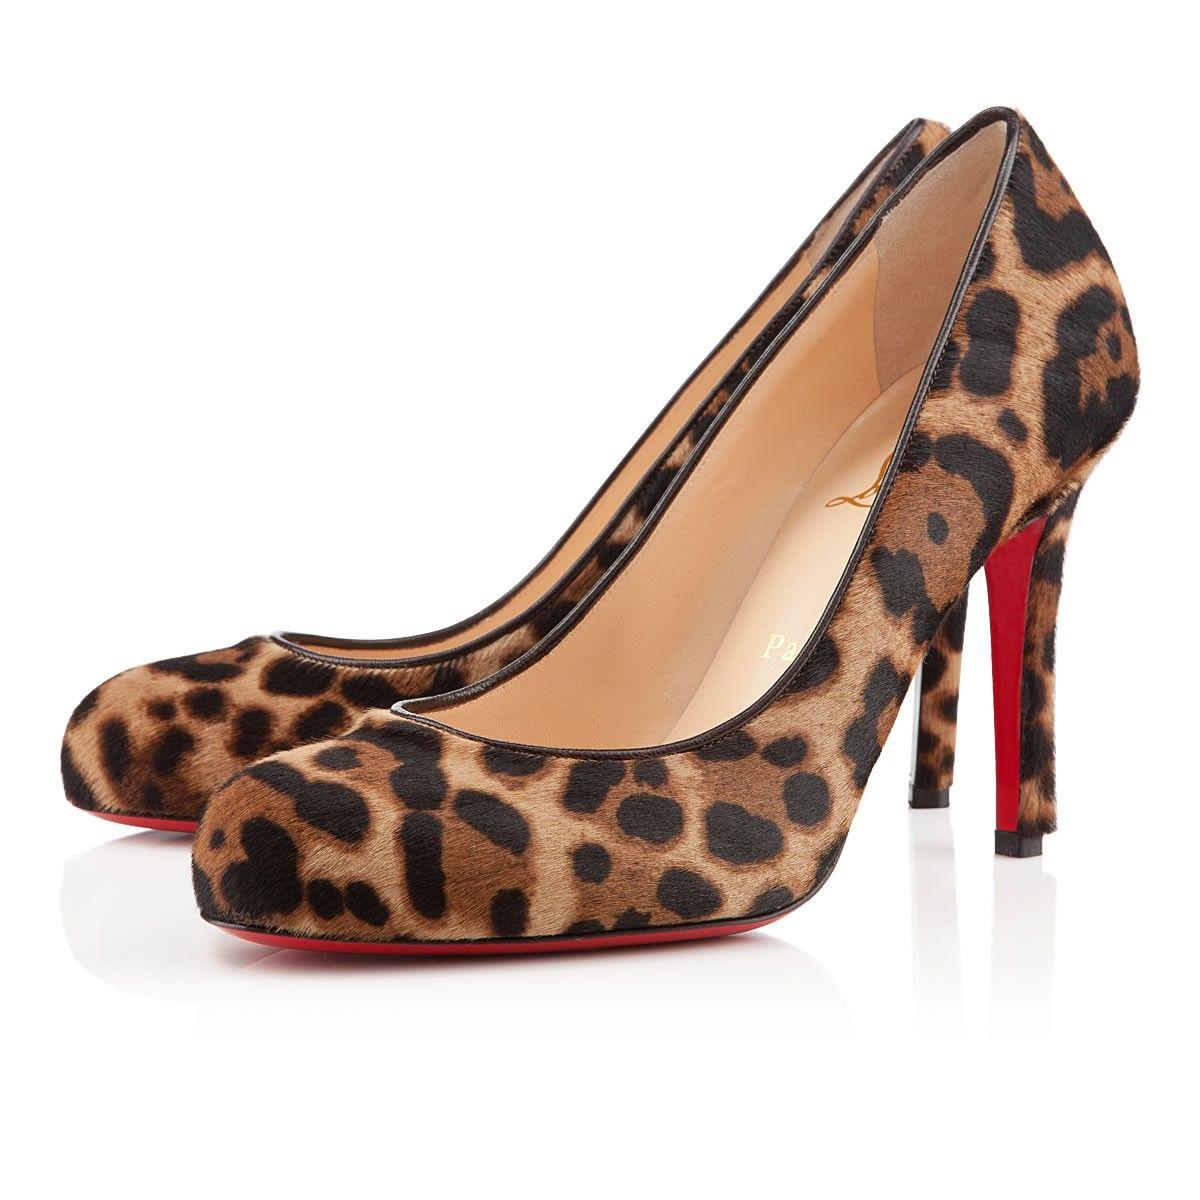 online store 8ddfc fb5ef Christian Louboutin Simple Pump 100mm Leopard | Wardrobe ...